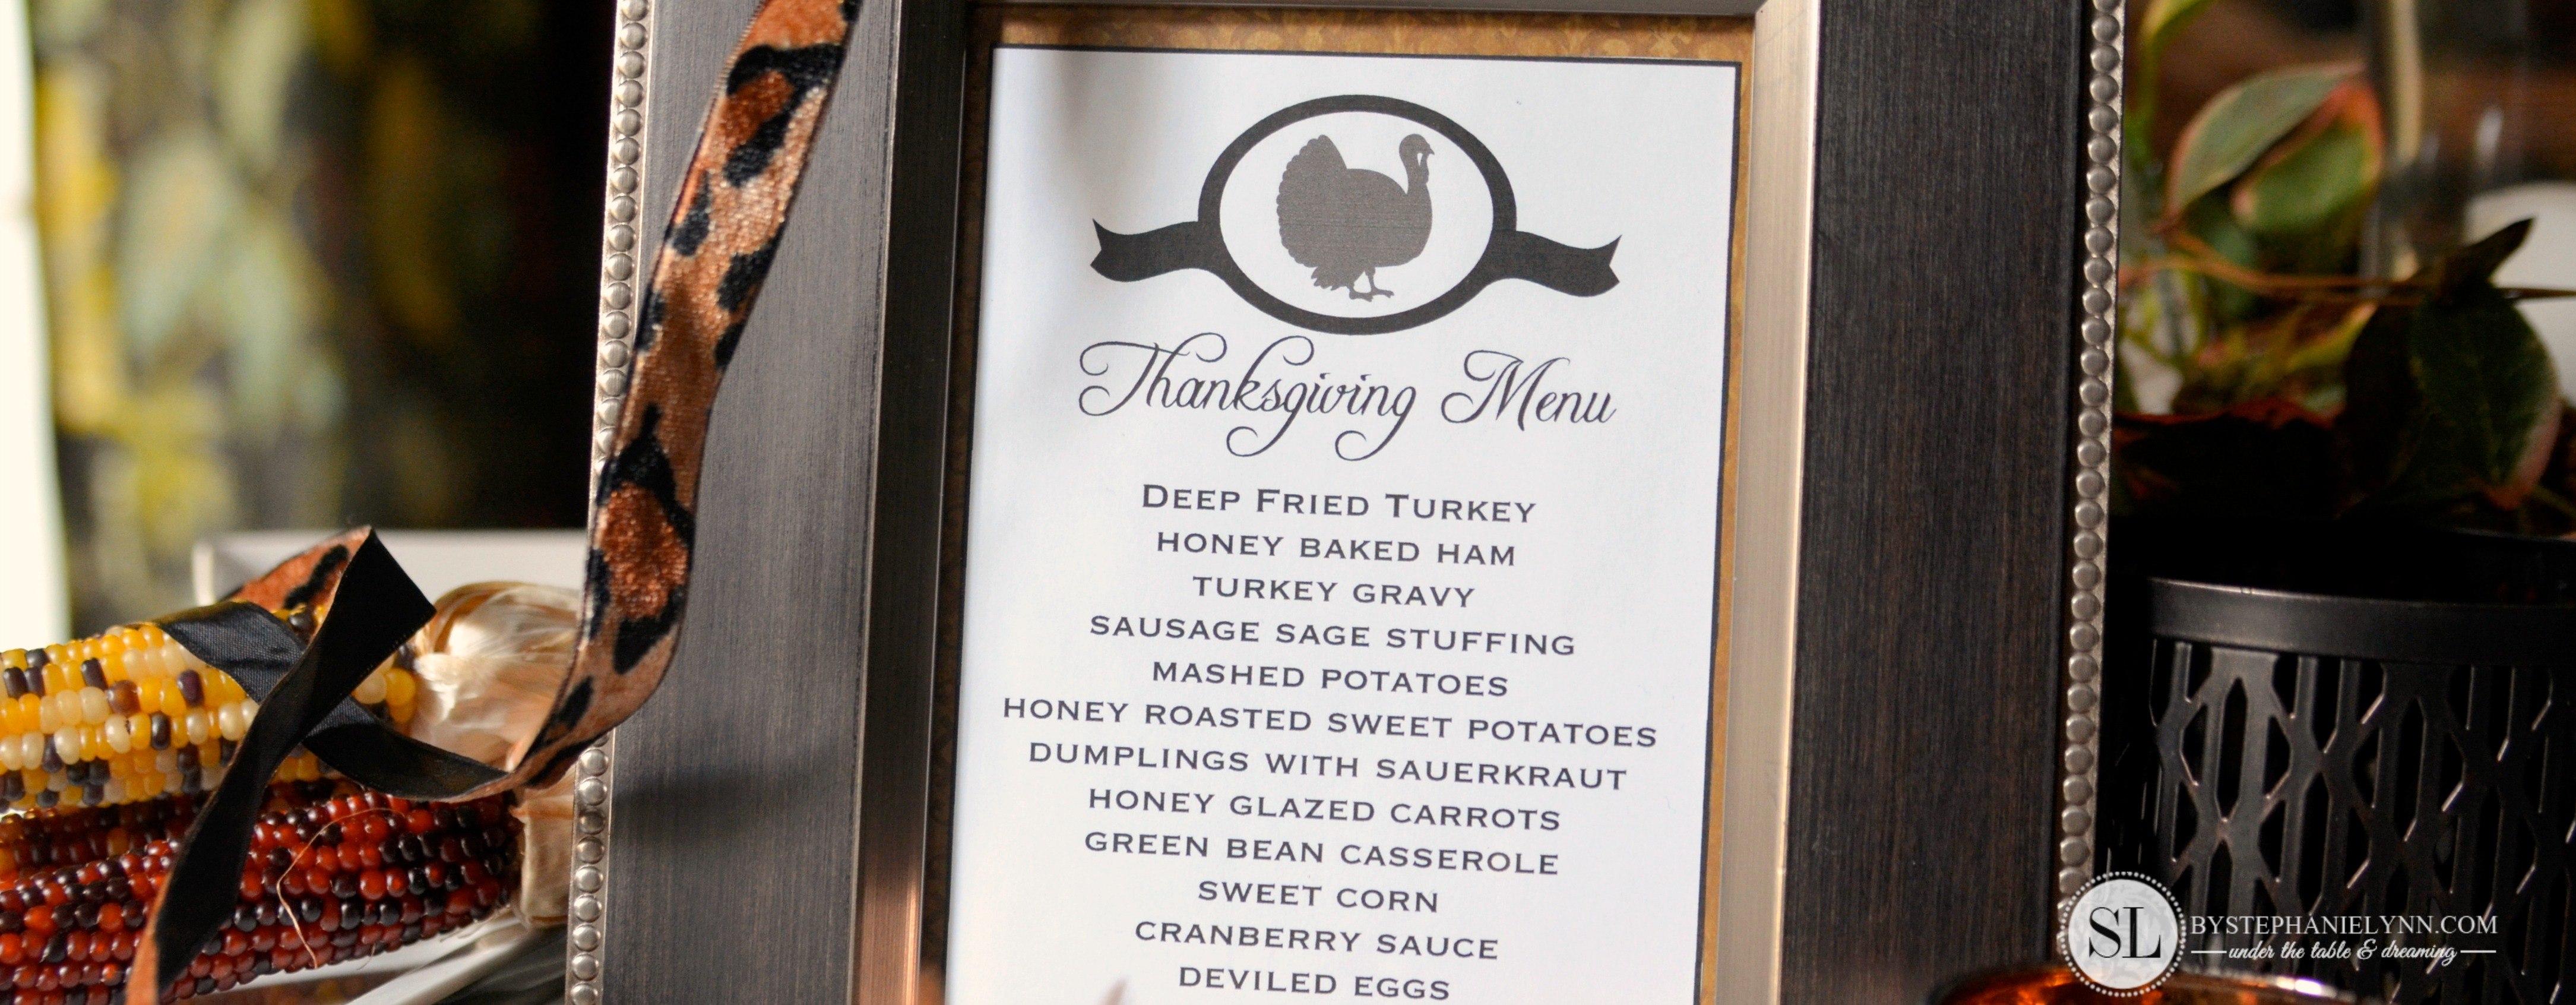 Printable Thanksgiving Menu Template  Making Printables With The Throughout Thanksgiving Menu Template Printable